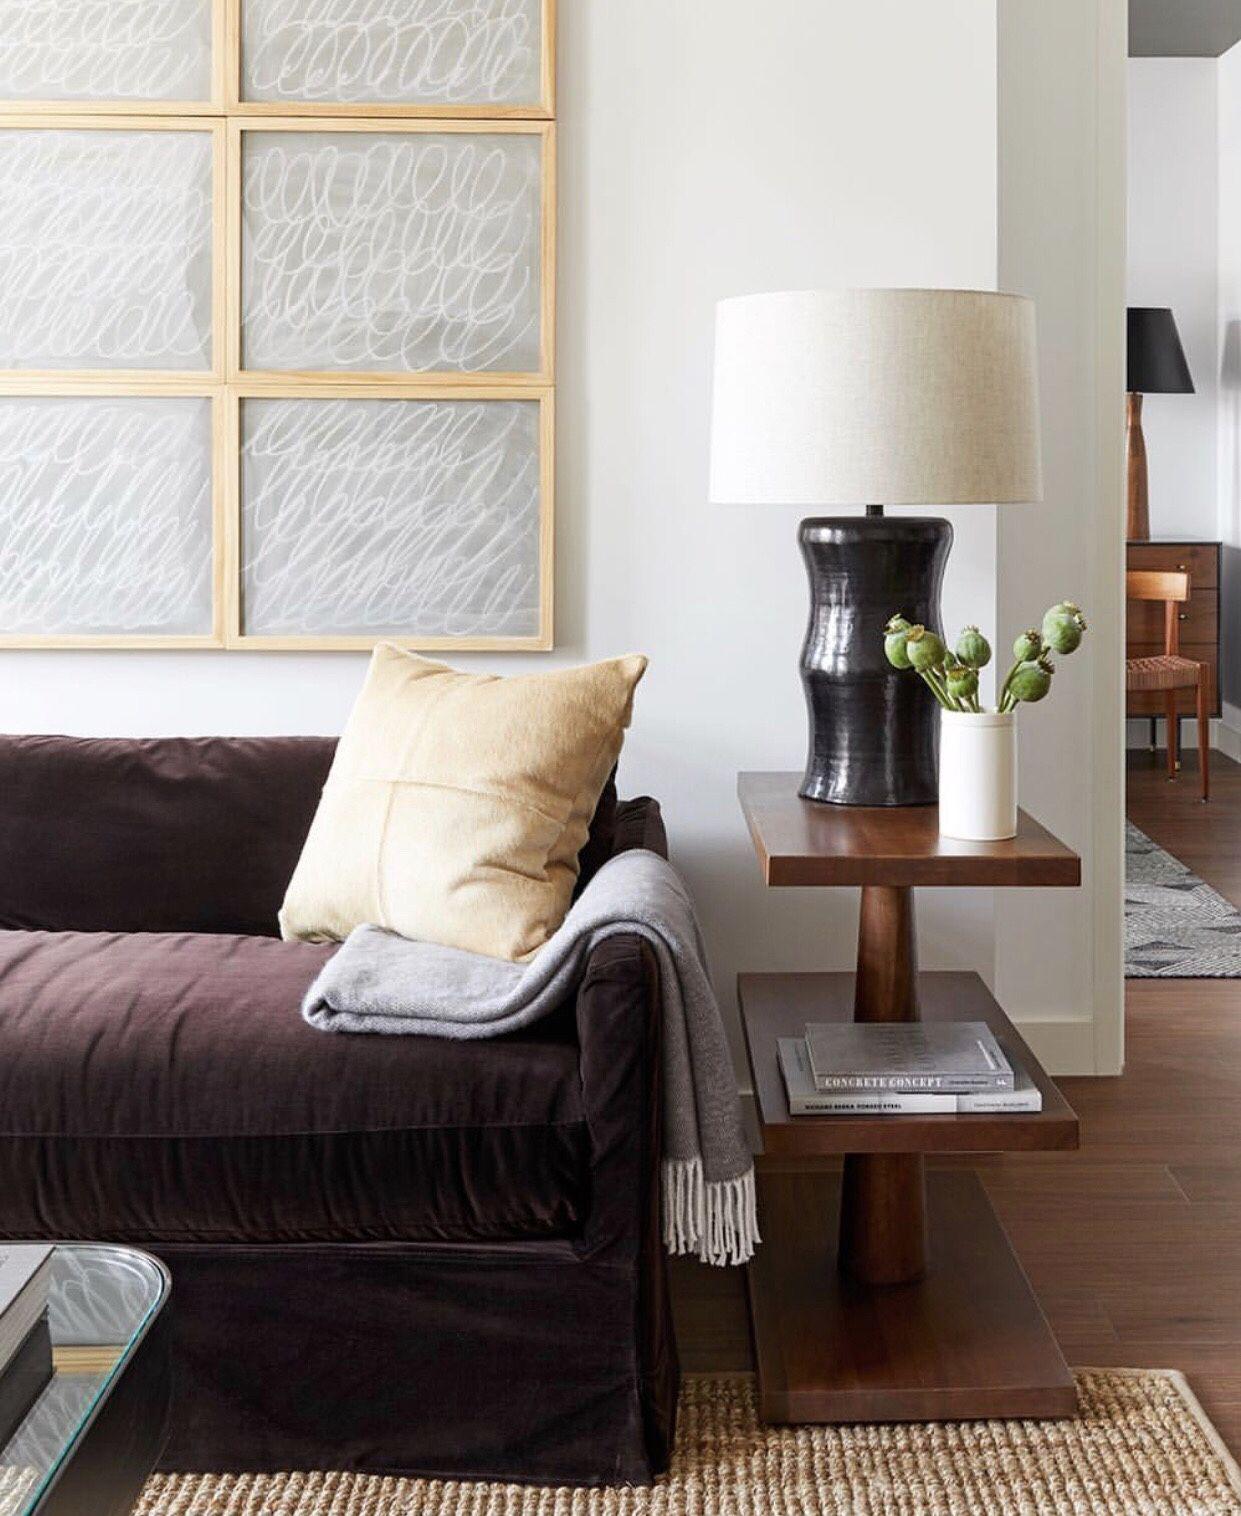 Living room design decor traditional modern art gallery wall also rh pinterest